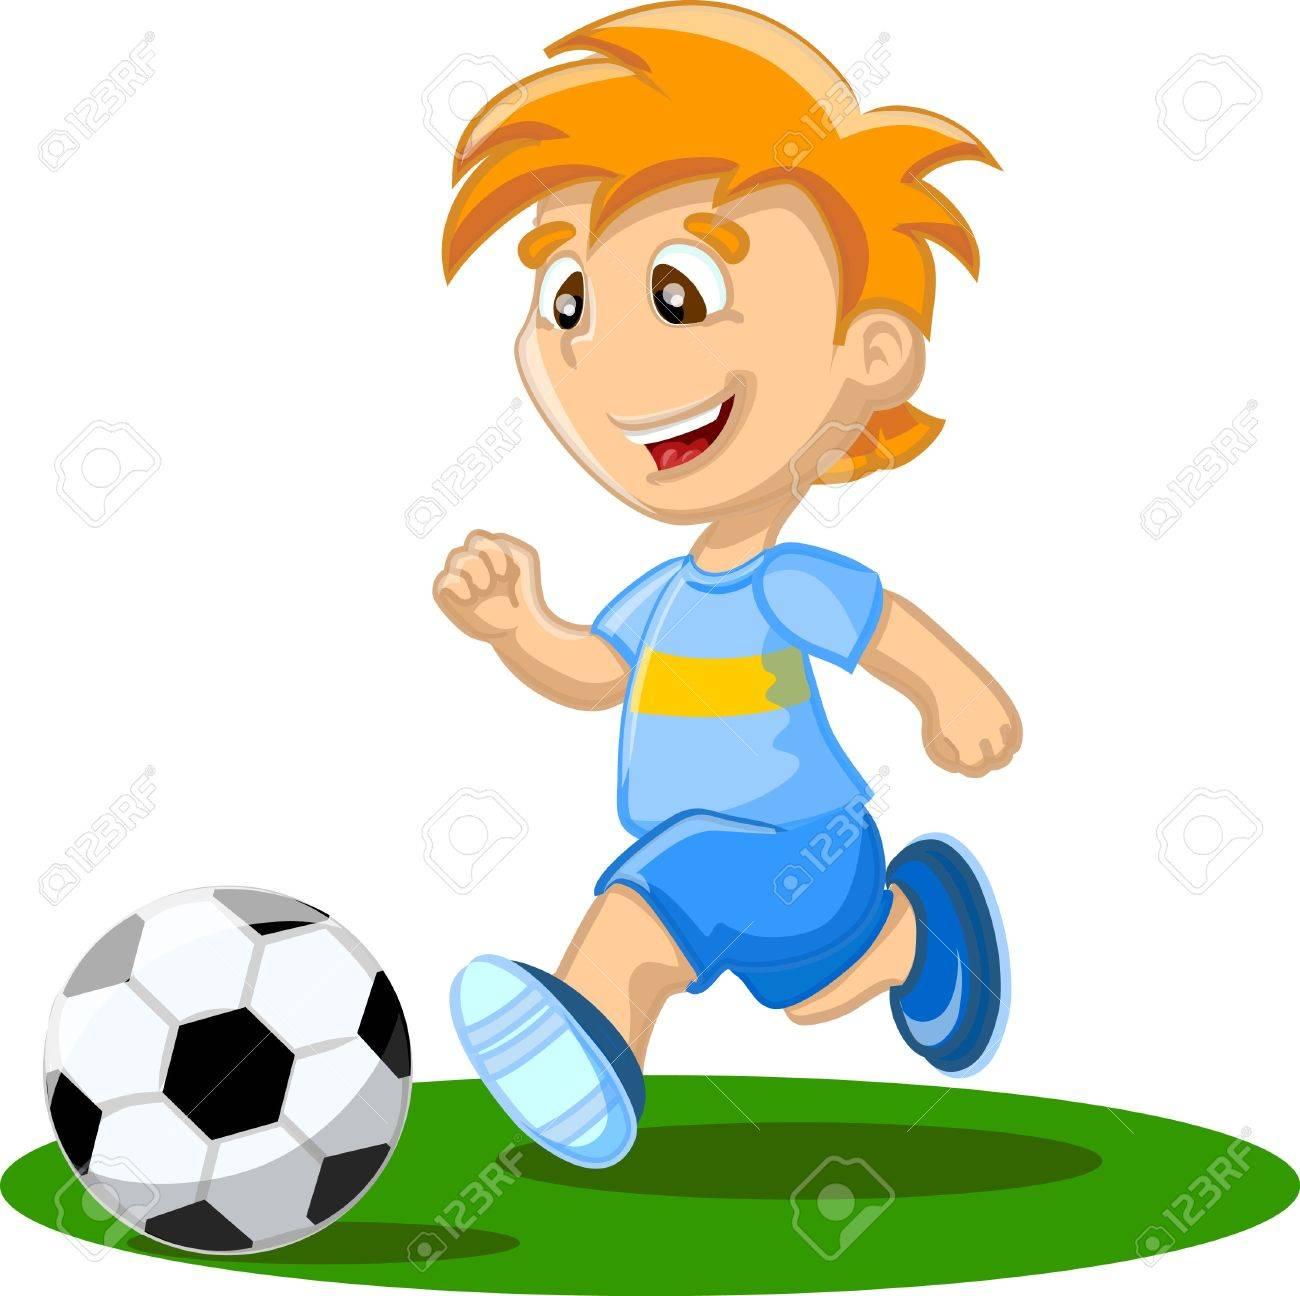 Boy play football.